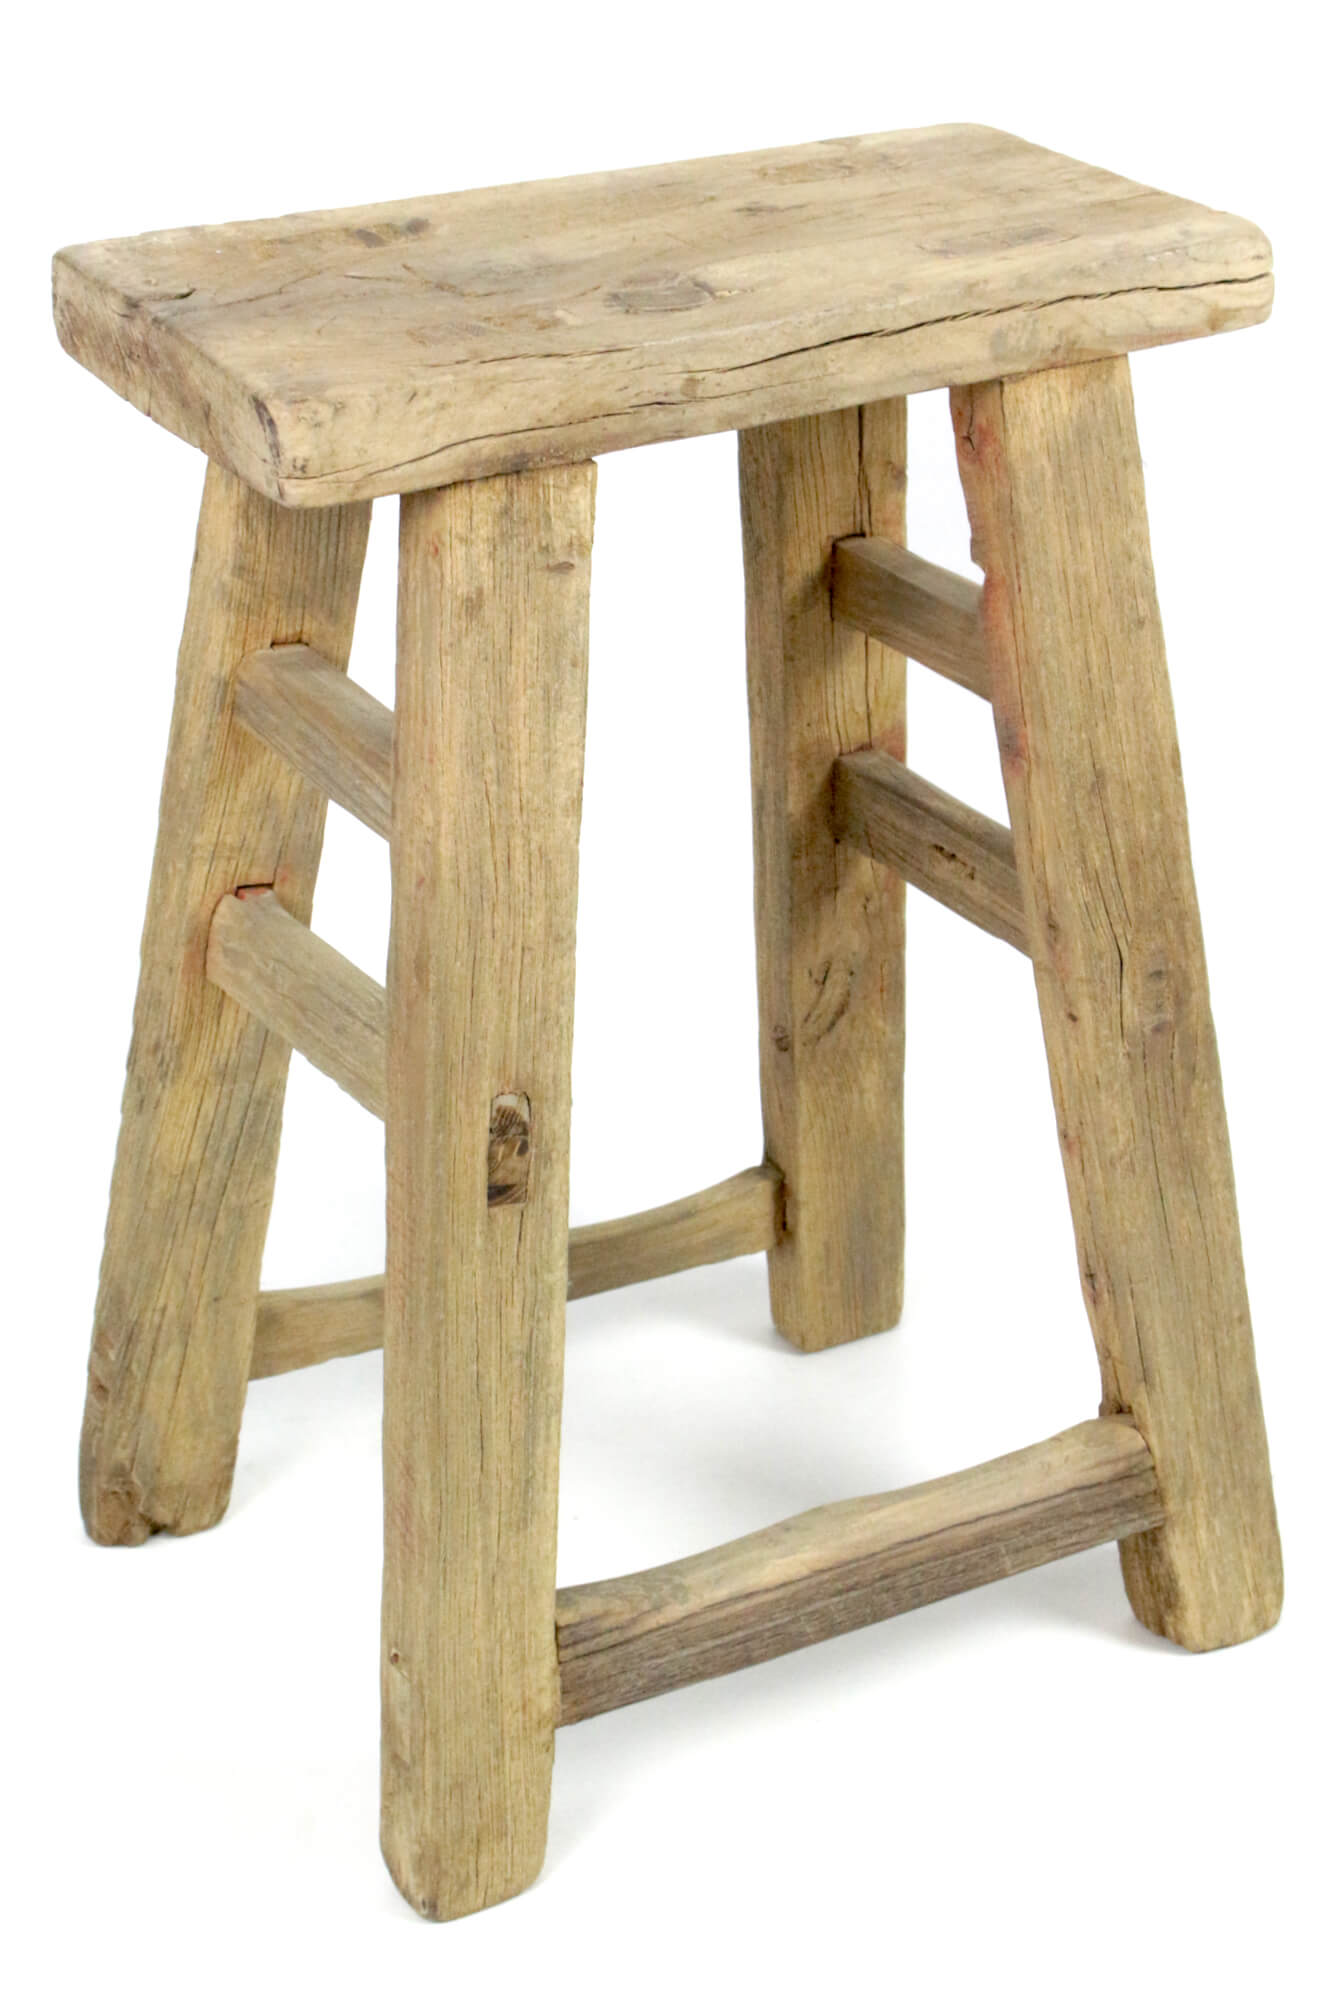 Arbeitshocker aus Holz, China antik